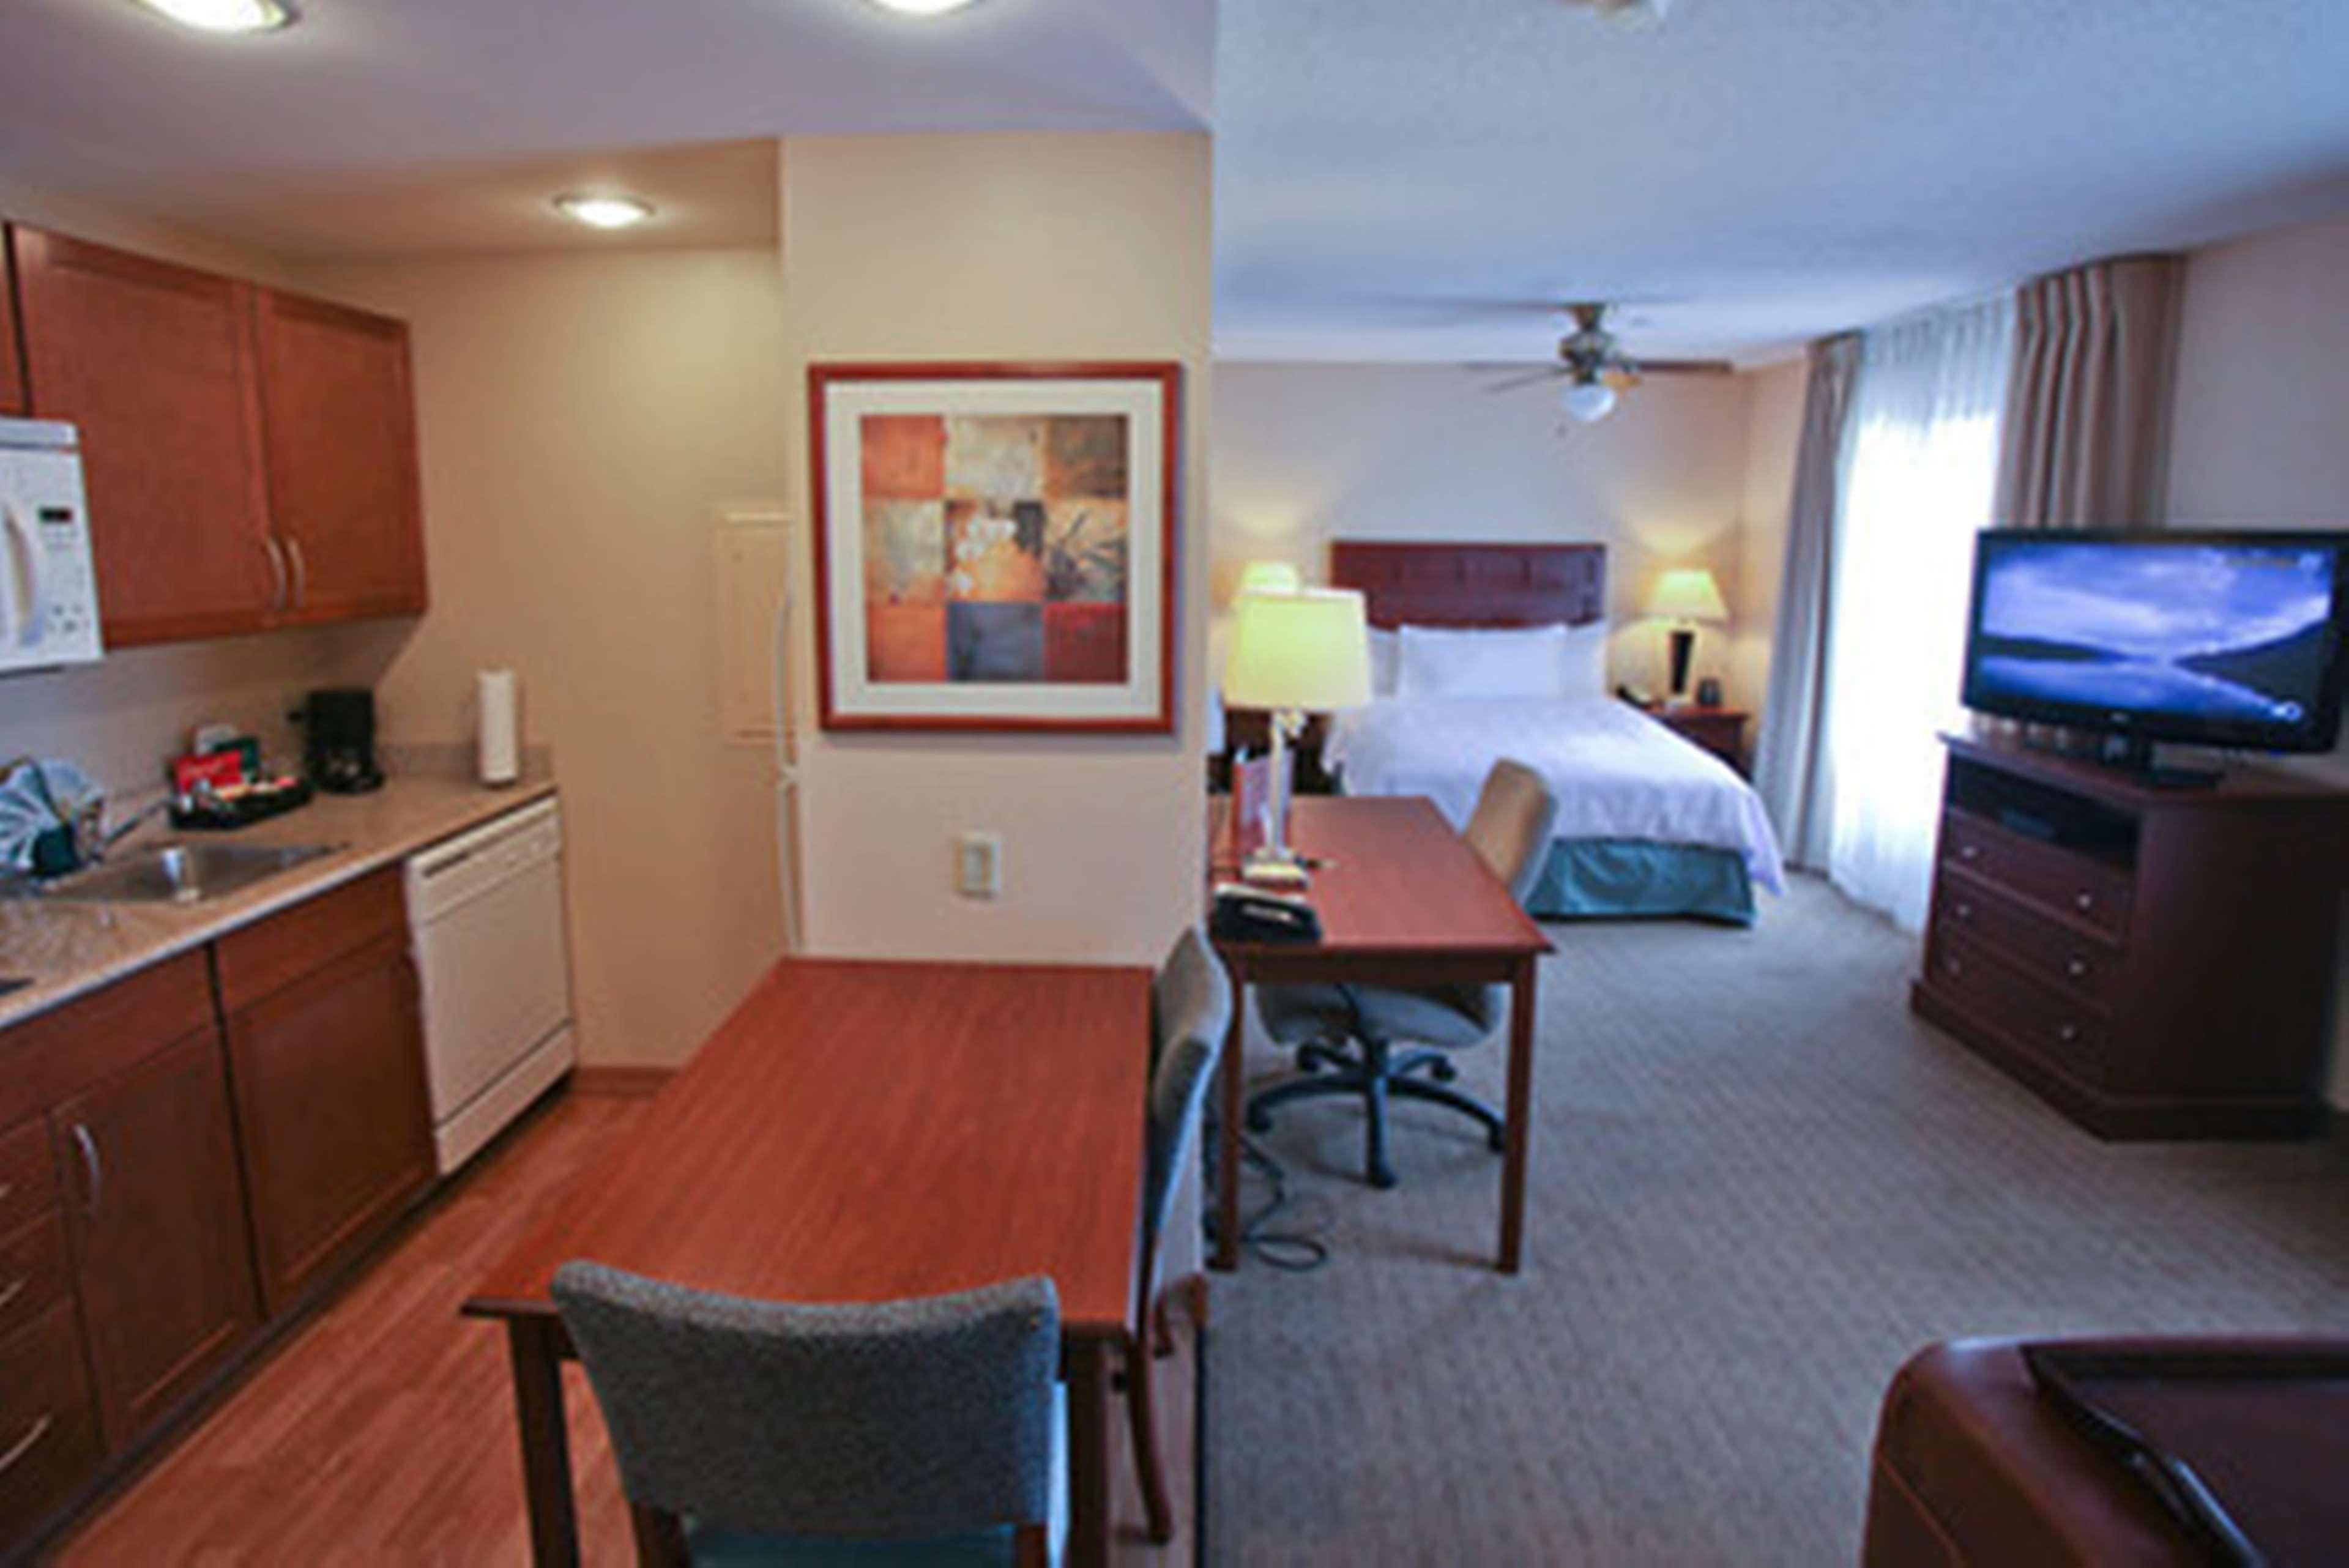 Homewood Suites by Hilton Orland Park image 28